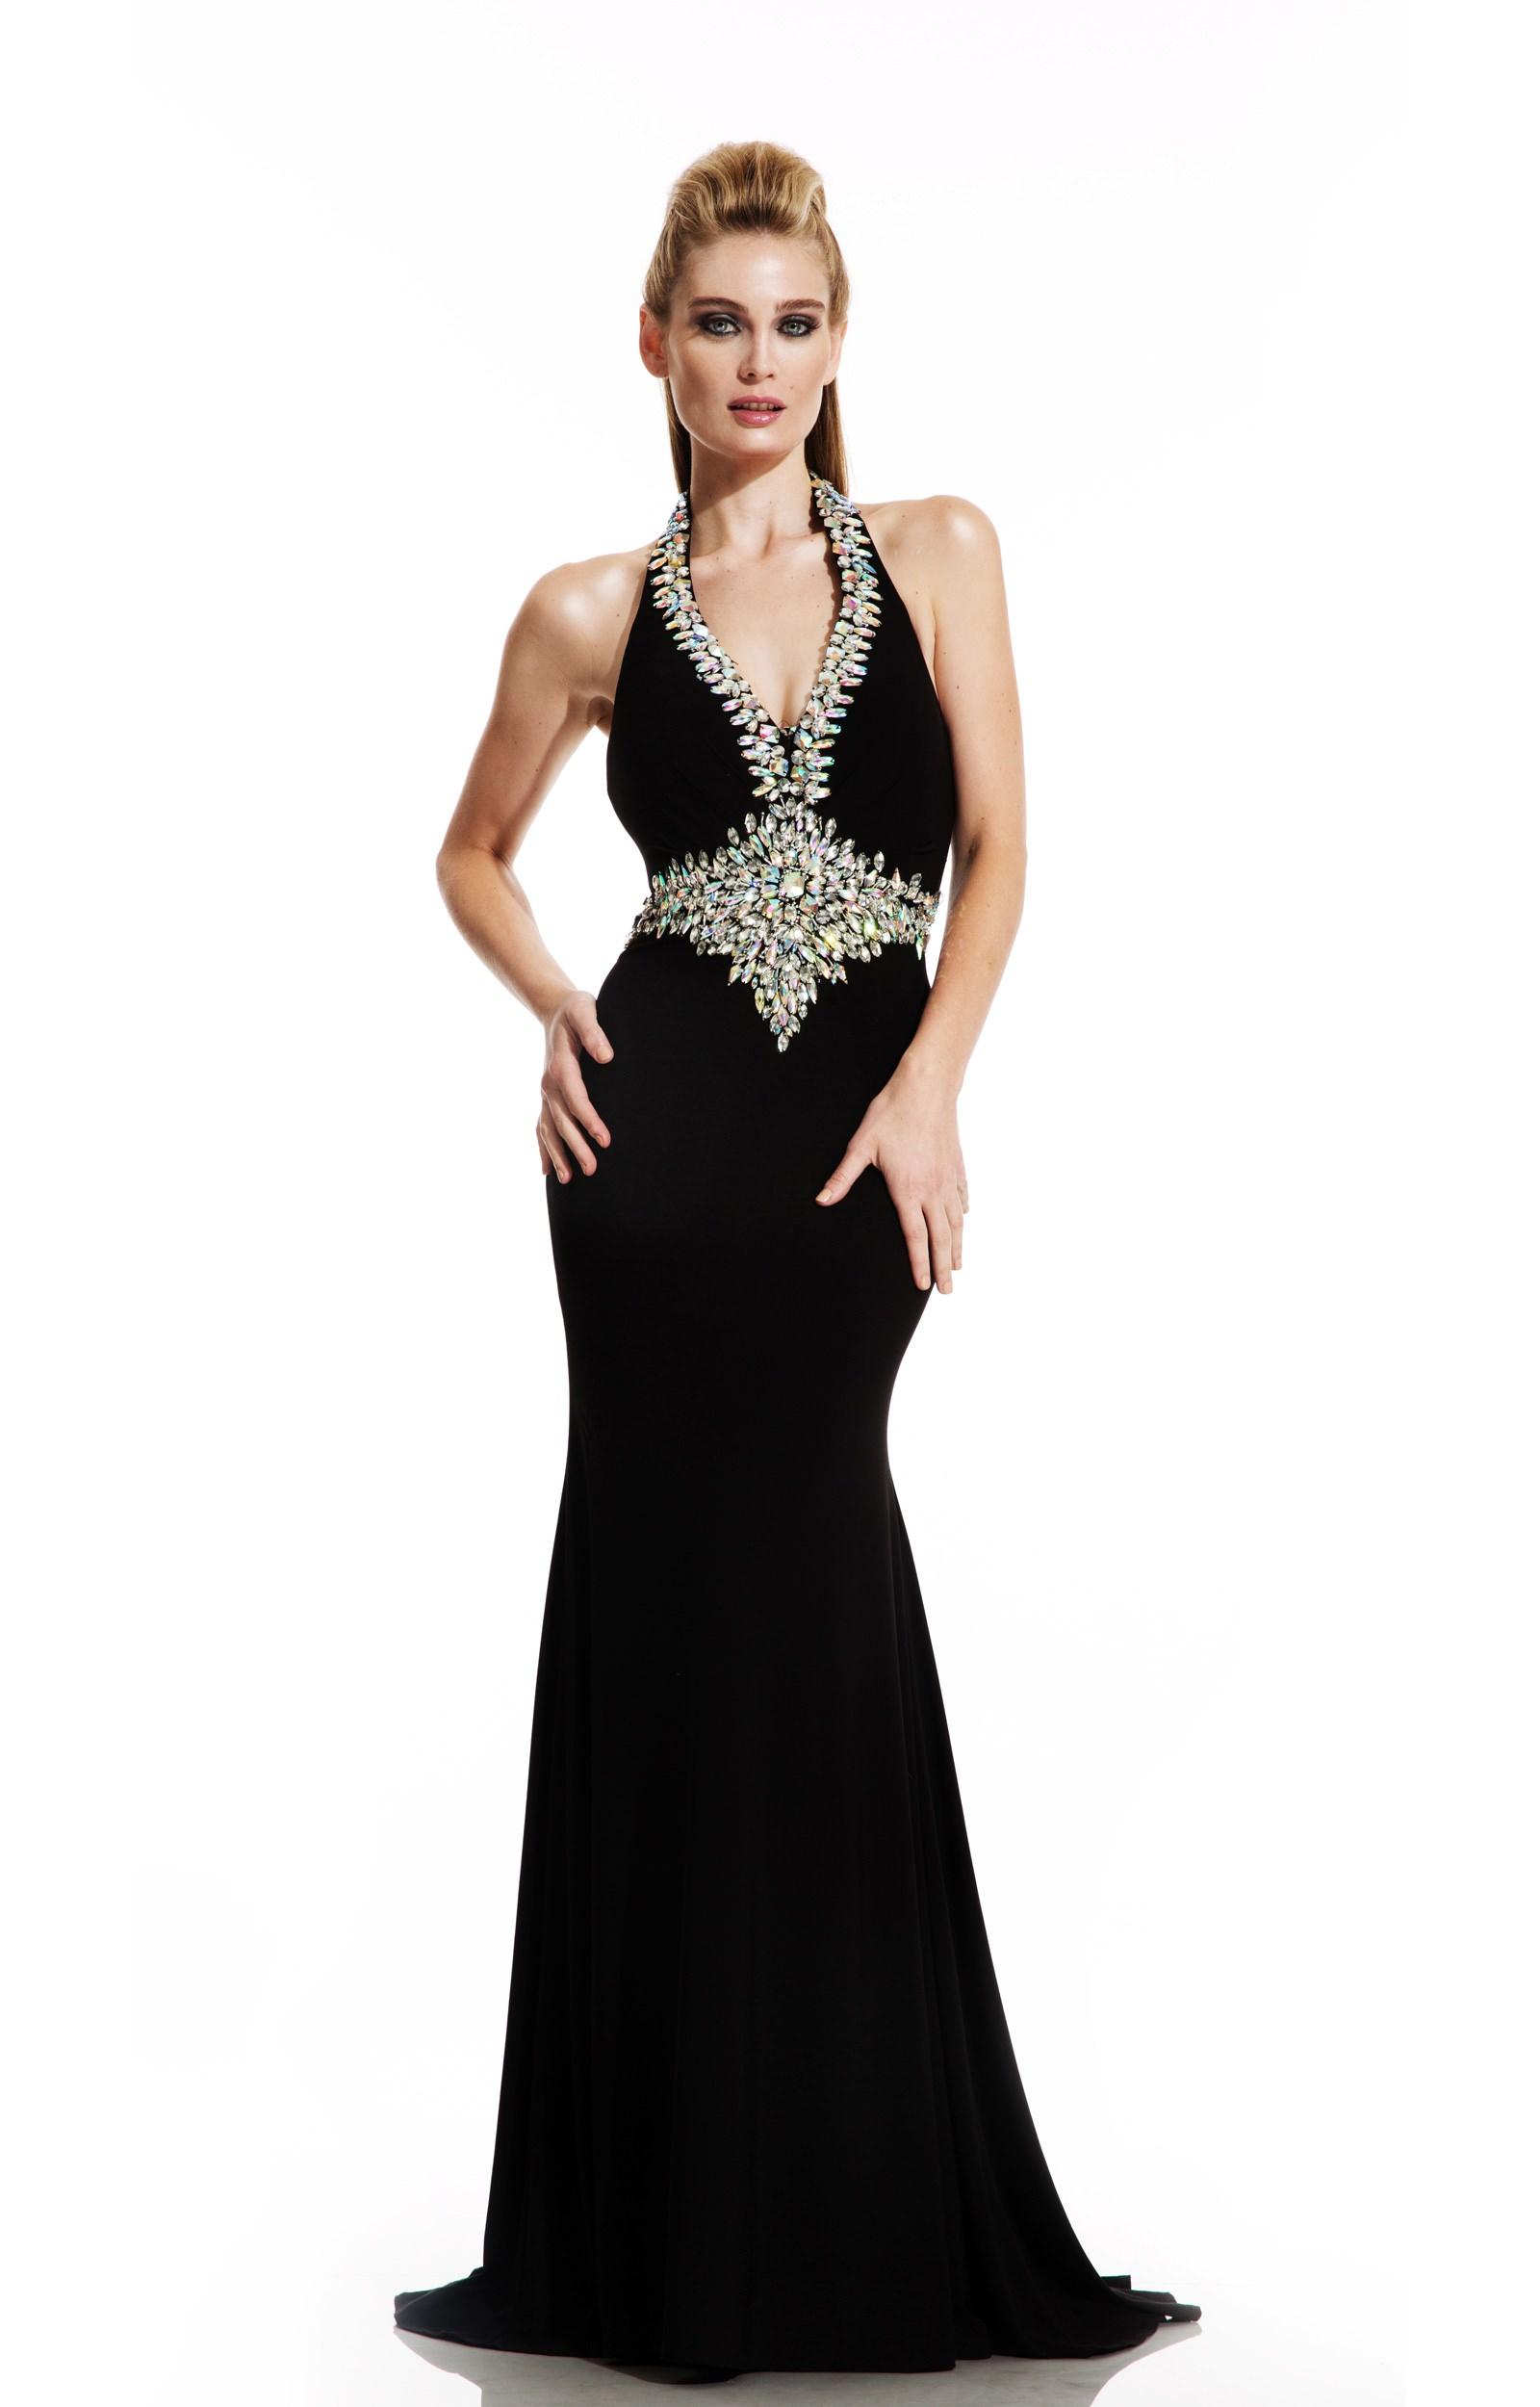 Johnathan Kayne 250 Formal Evening Prom Dress